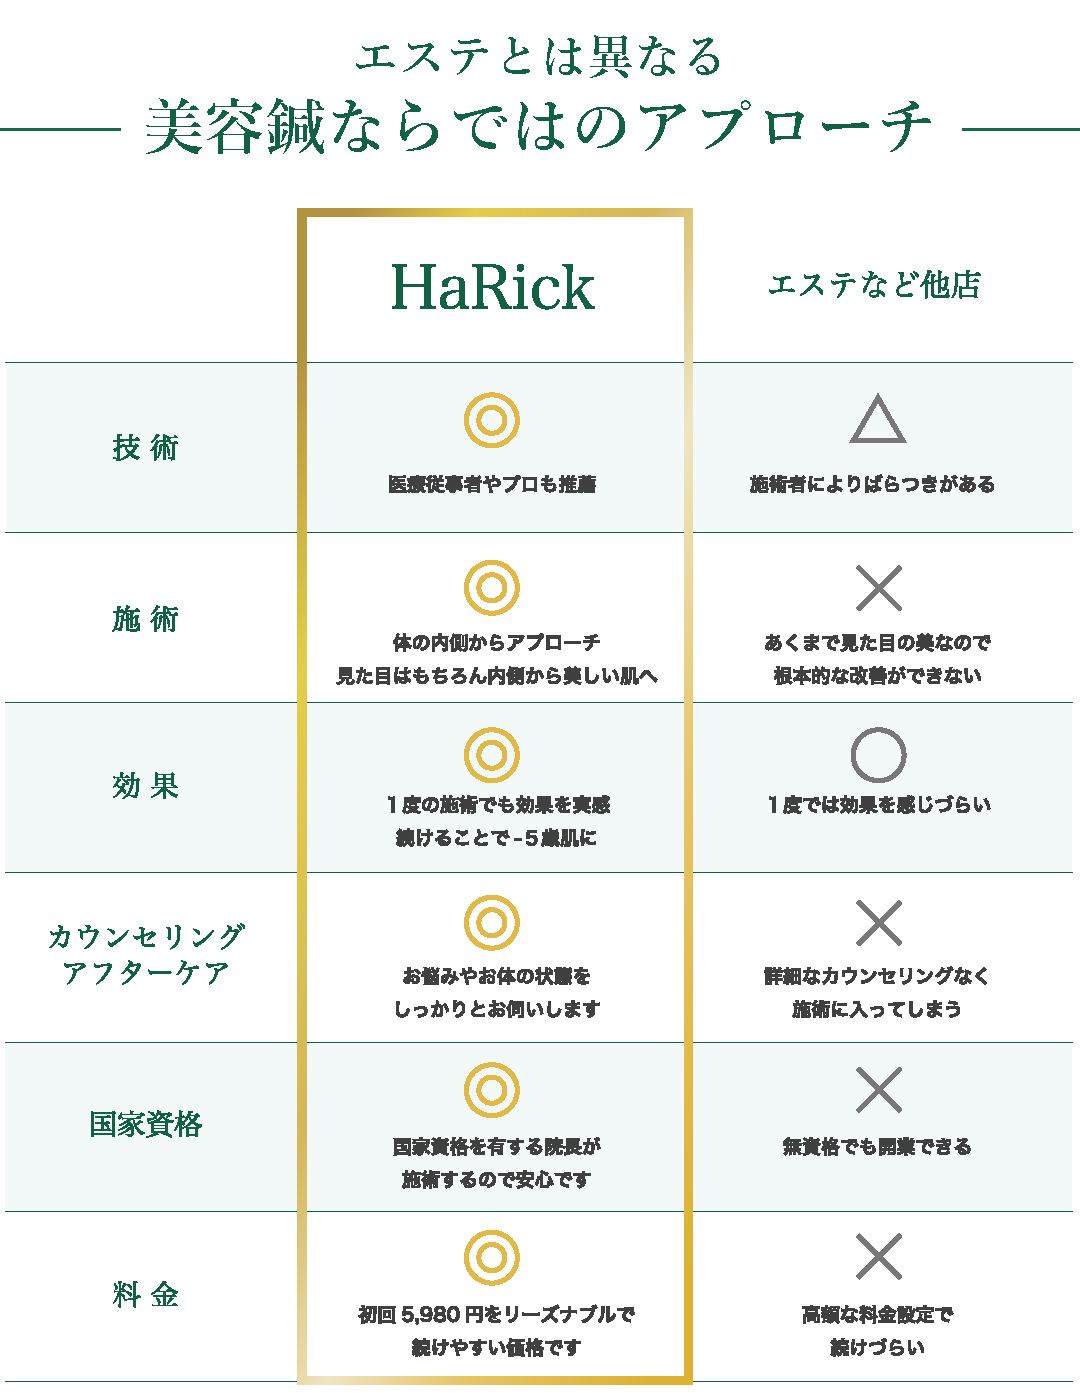 HaRick美容鍼灸整体とエステの違い